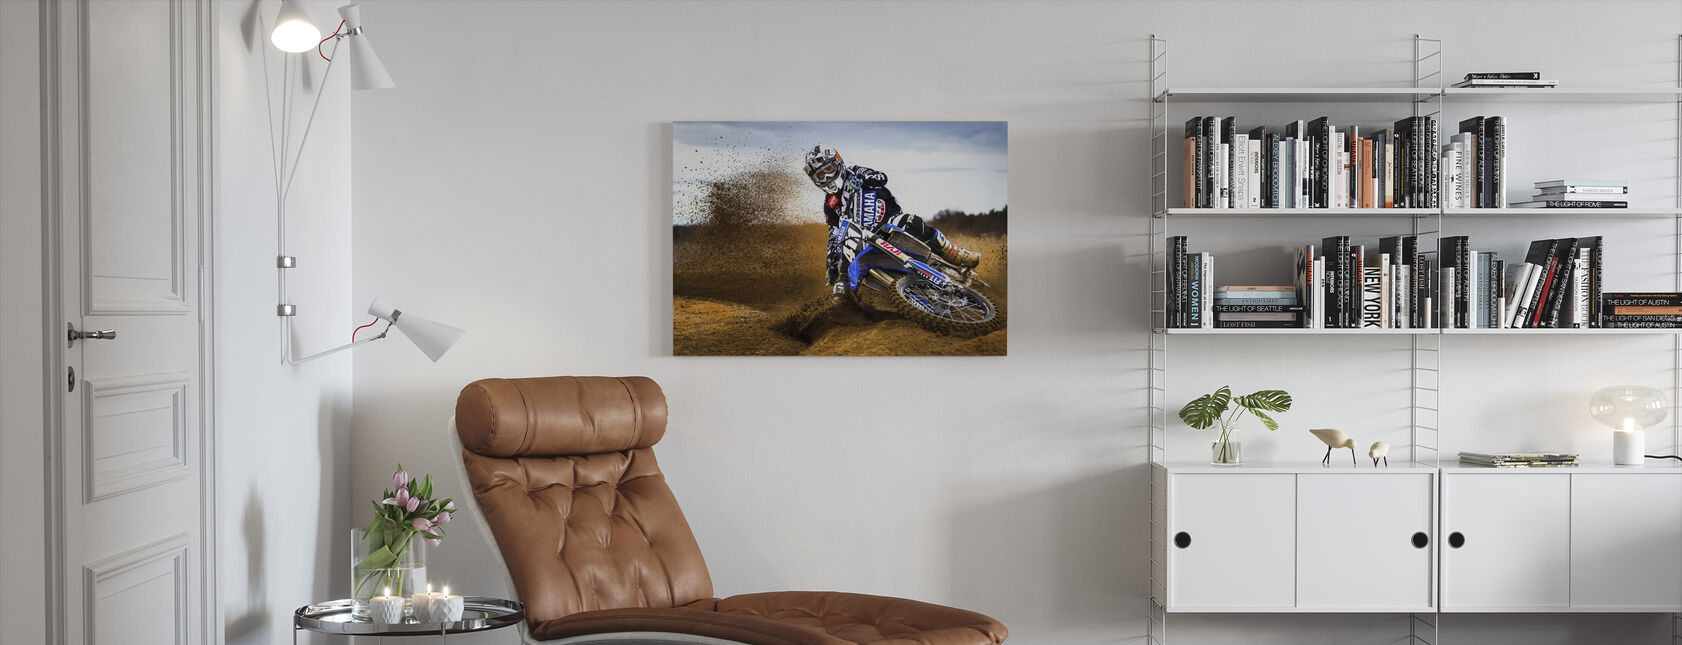 Woestijnkoning - Canvas print - Woonkamer